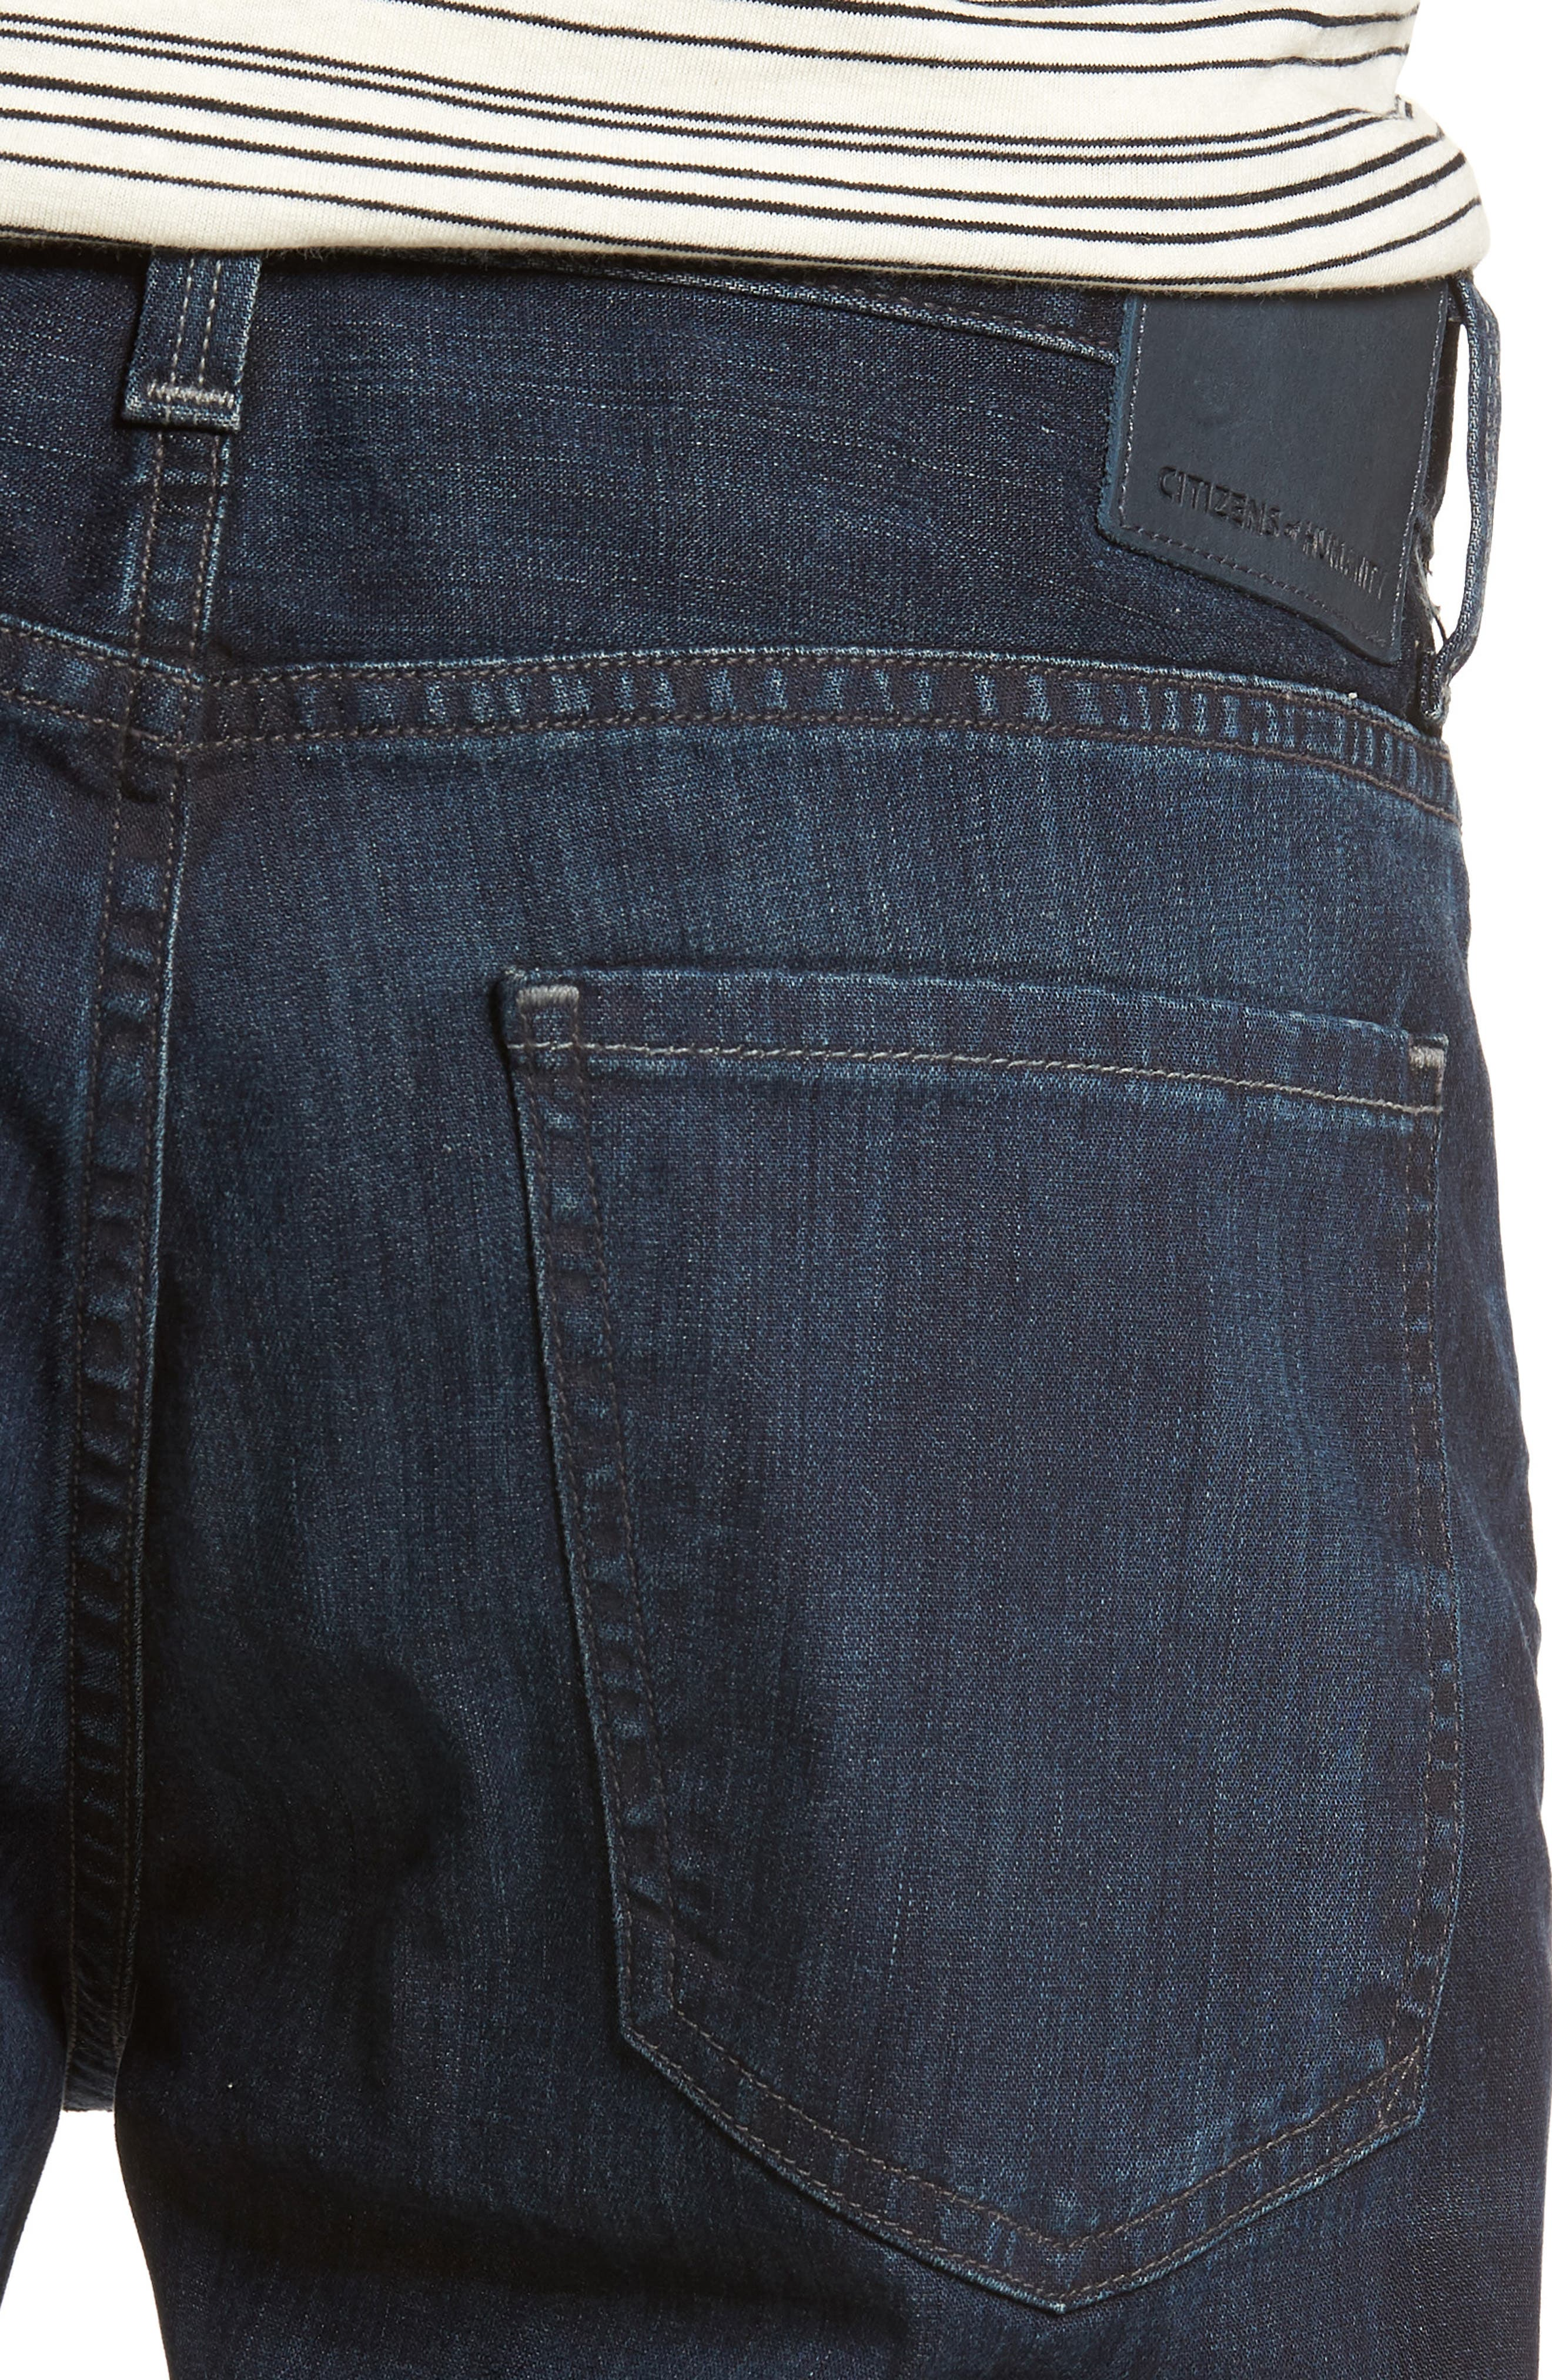 Gage Slim Straight Leg Jeans,                             Alternate thumbnail 4, color,                             Newman